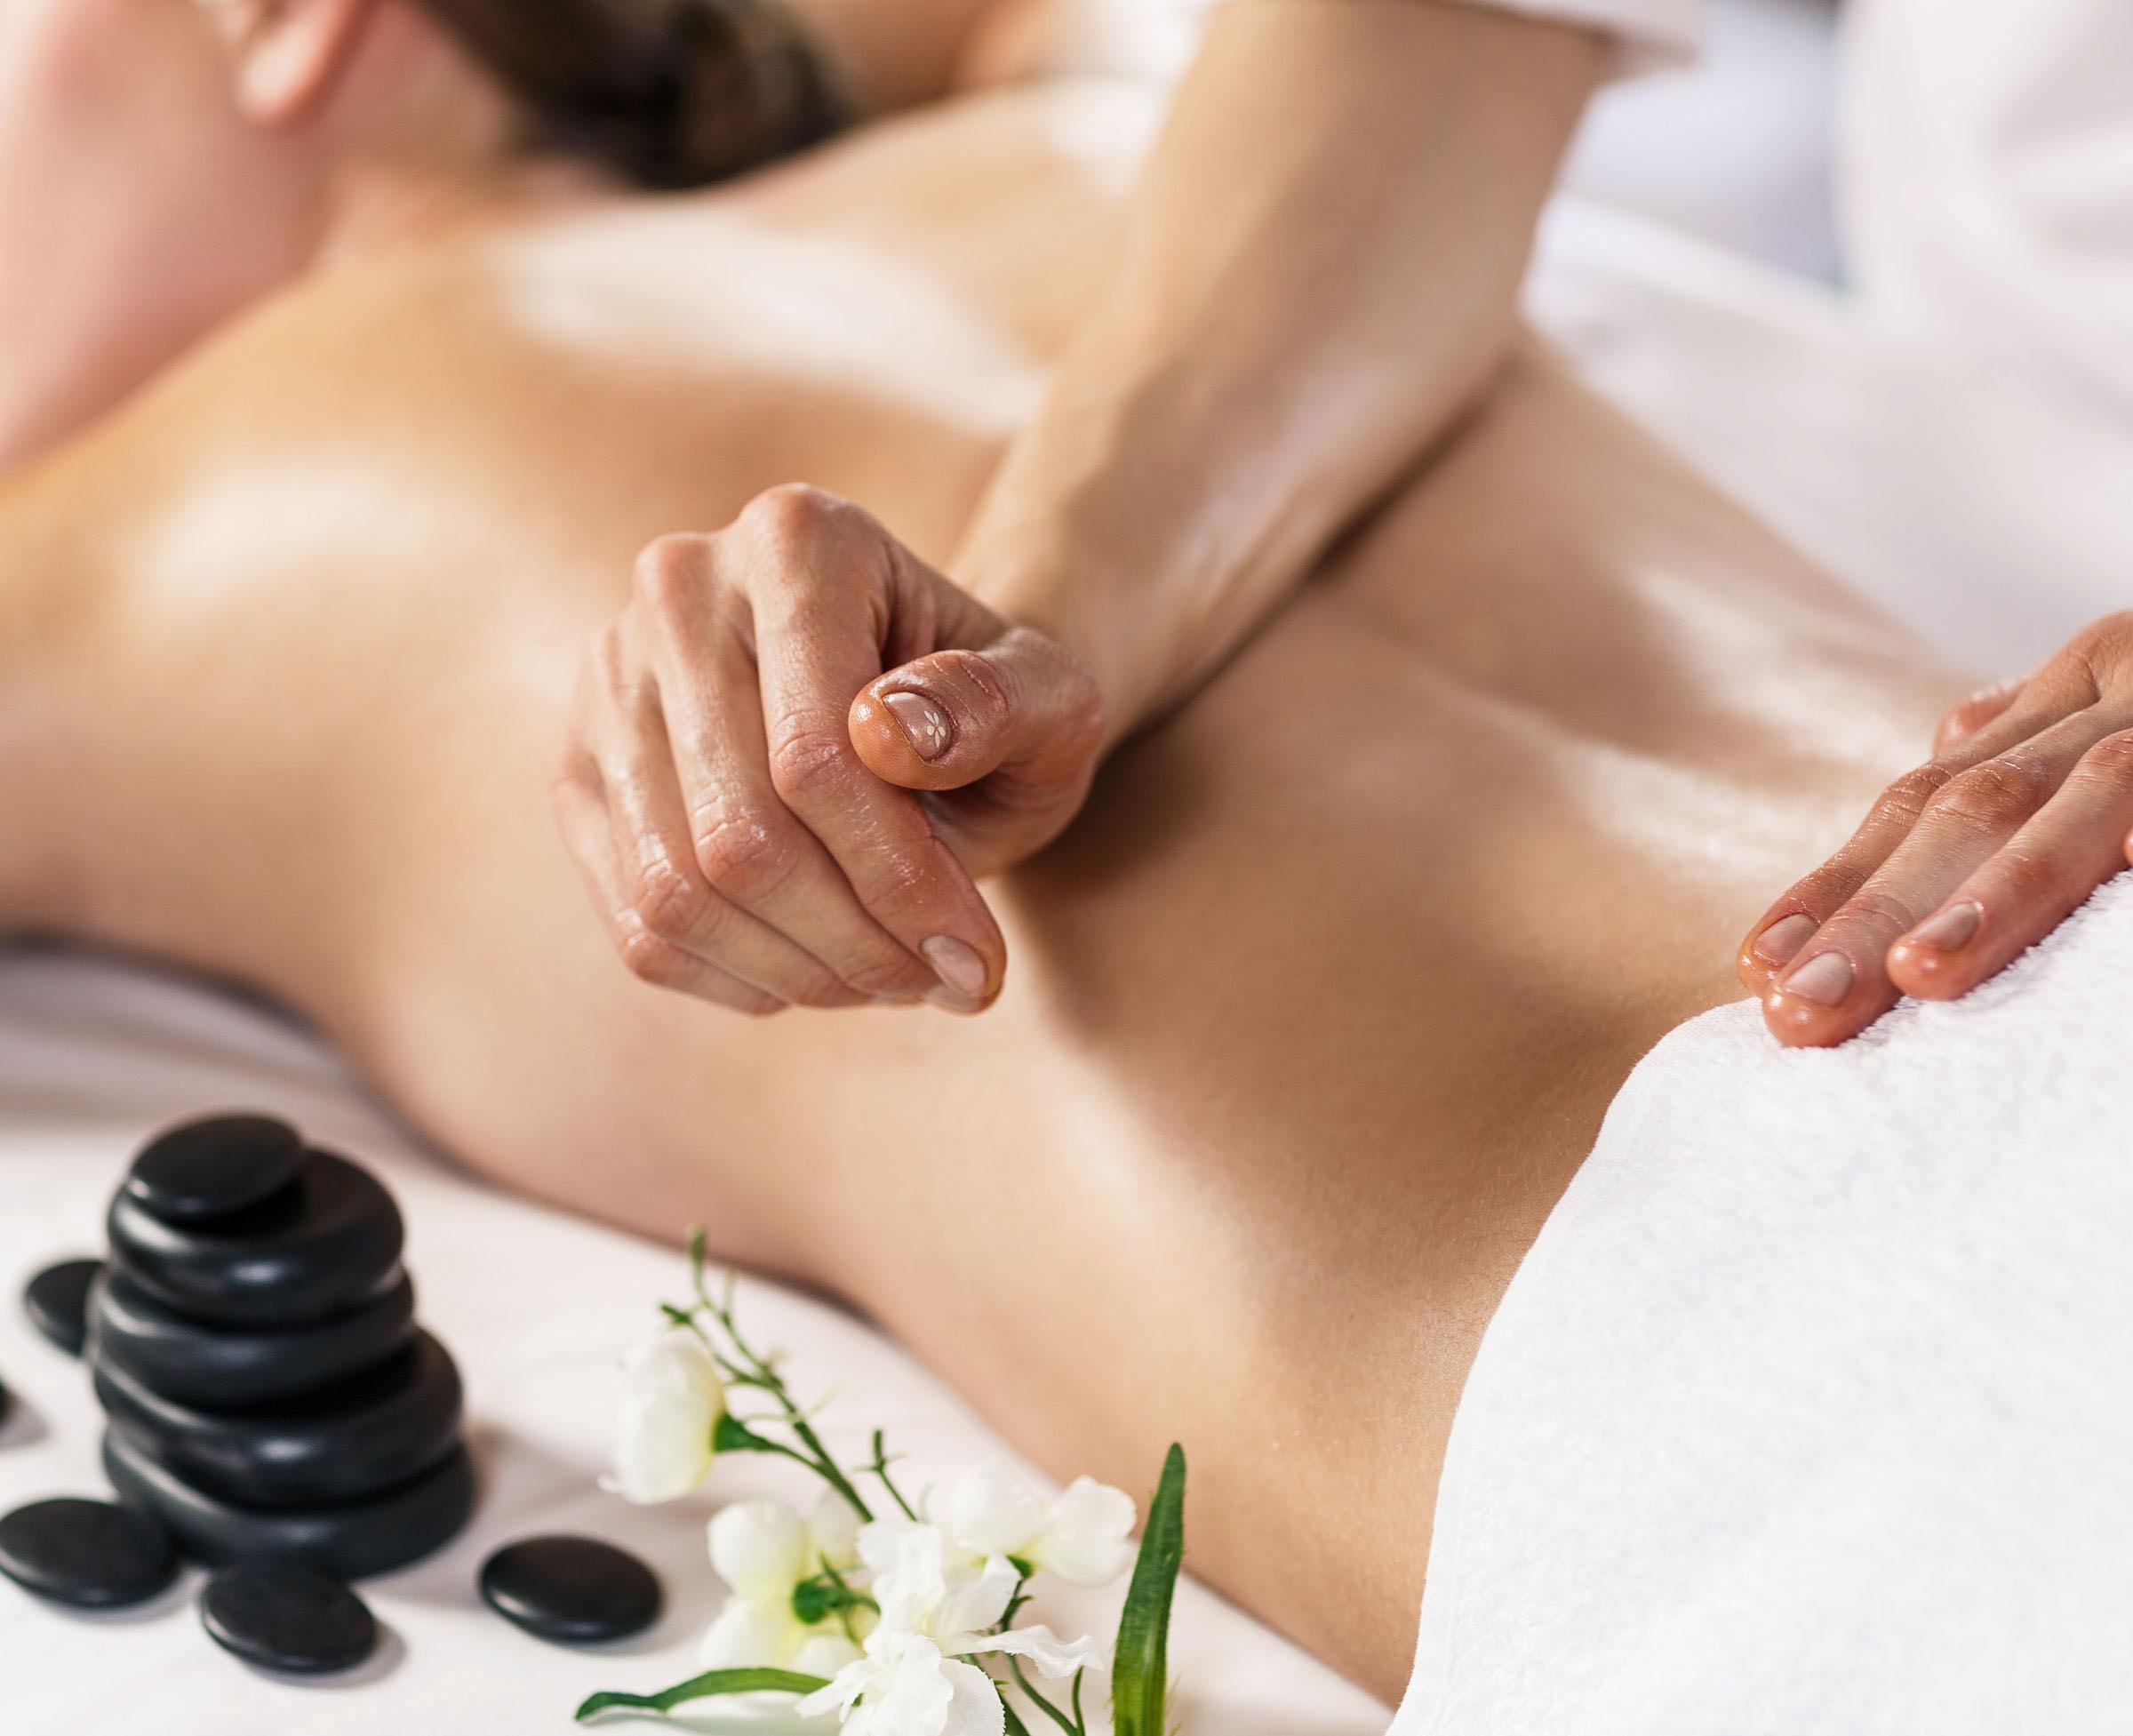 massage californien chateau gombert - marseille 13013 bouchge du rhone plan de Cuques Allauch